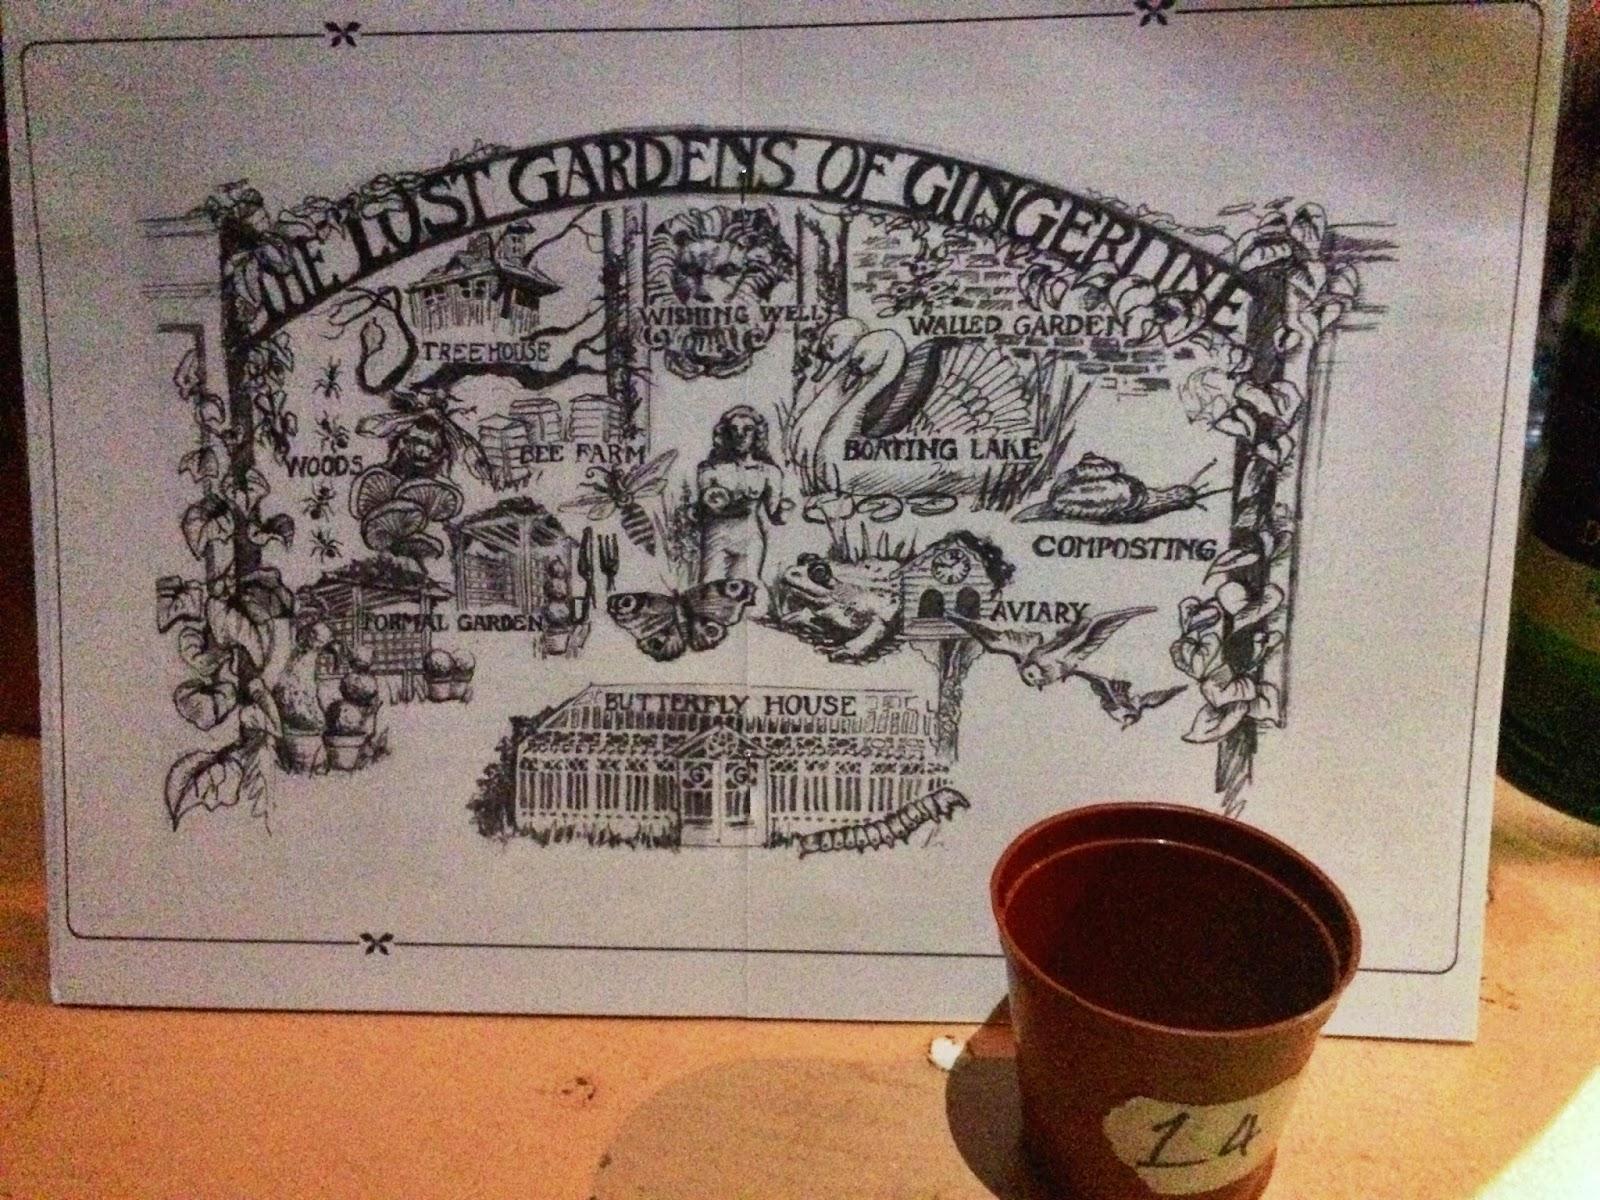 Lost Gardens Of Gingerline Map